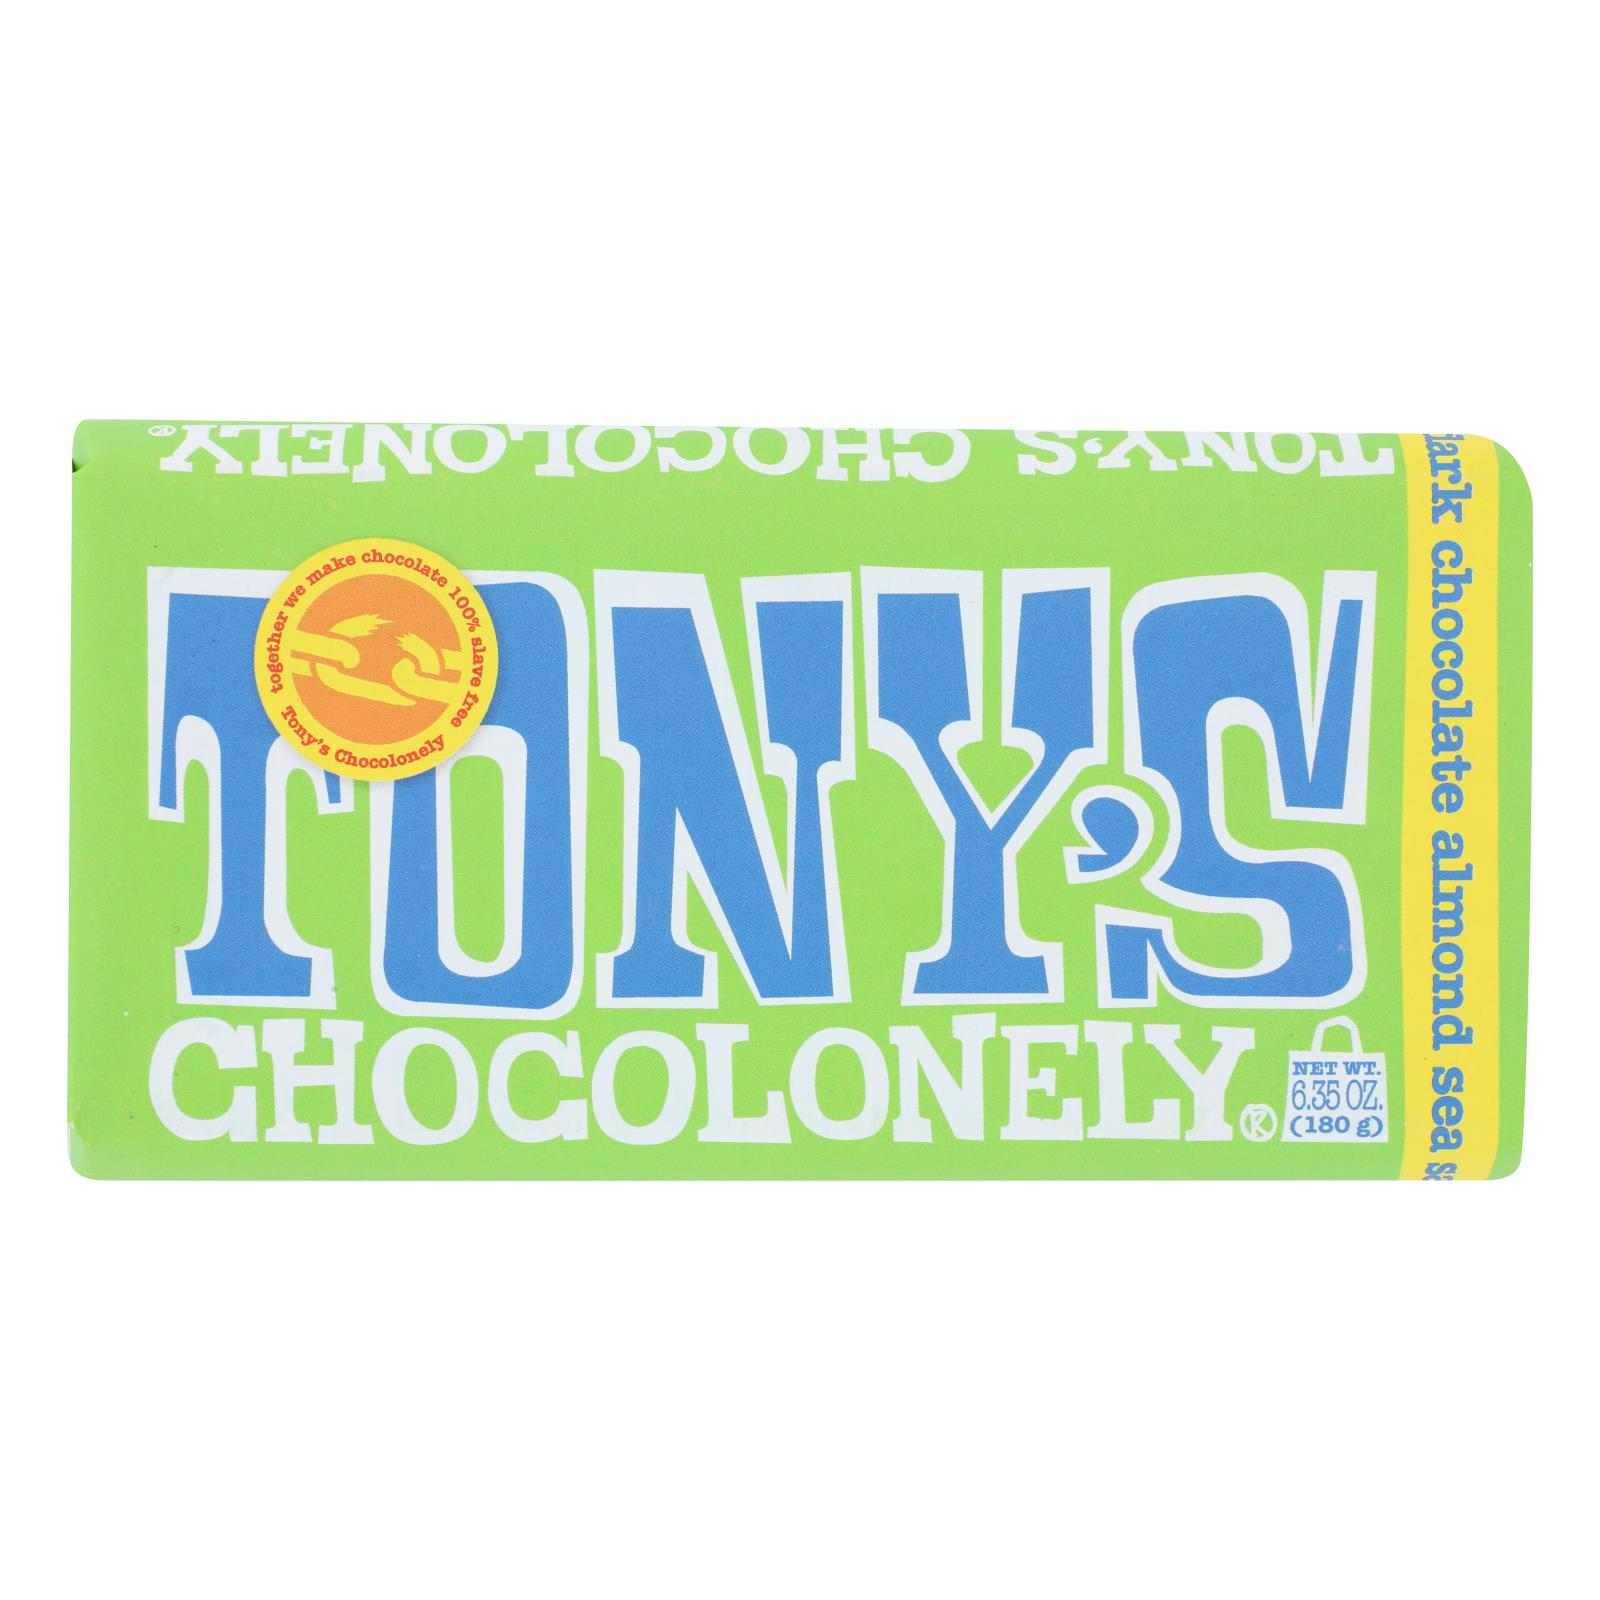 Tony's Chocolonely - Bar Chocolate Dk Almond Sea Salt 51% - Case of 15 - 6.35 OZ